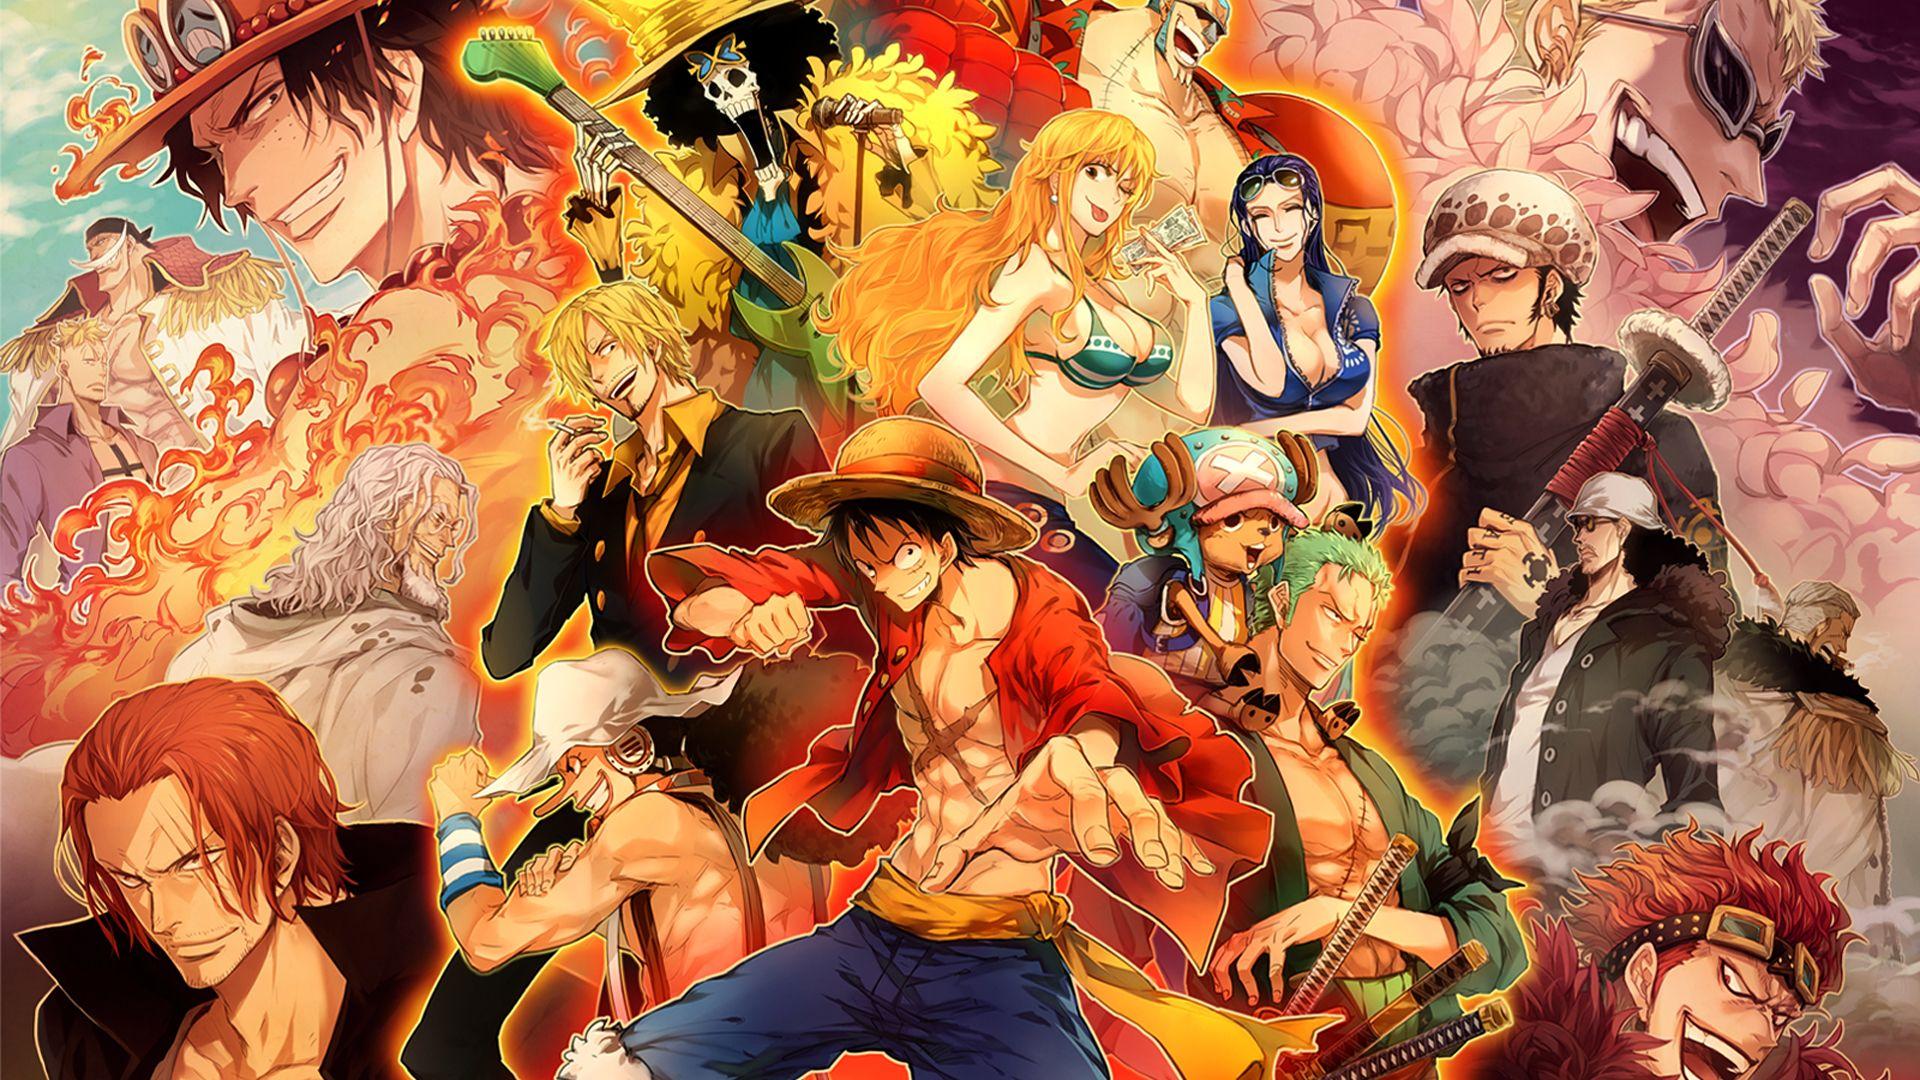 Anime Wallpaper One Piece One Piece Anime Wallpaper One Piece One Piece Anime Wallpapers